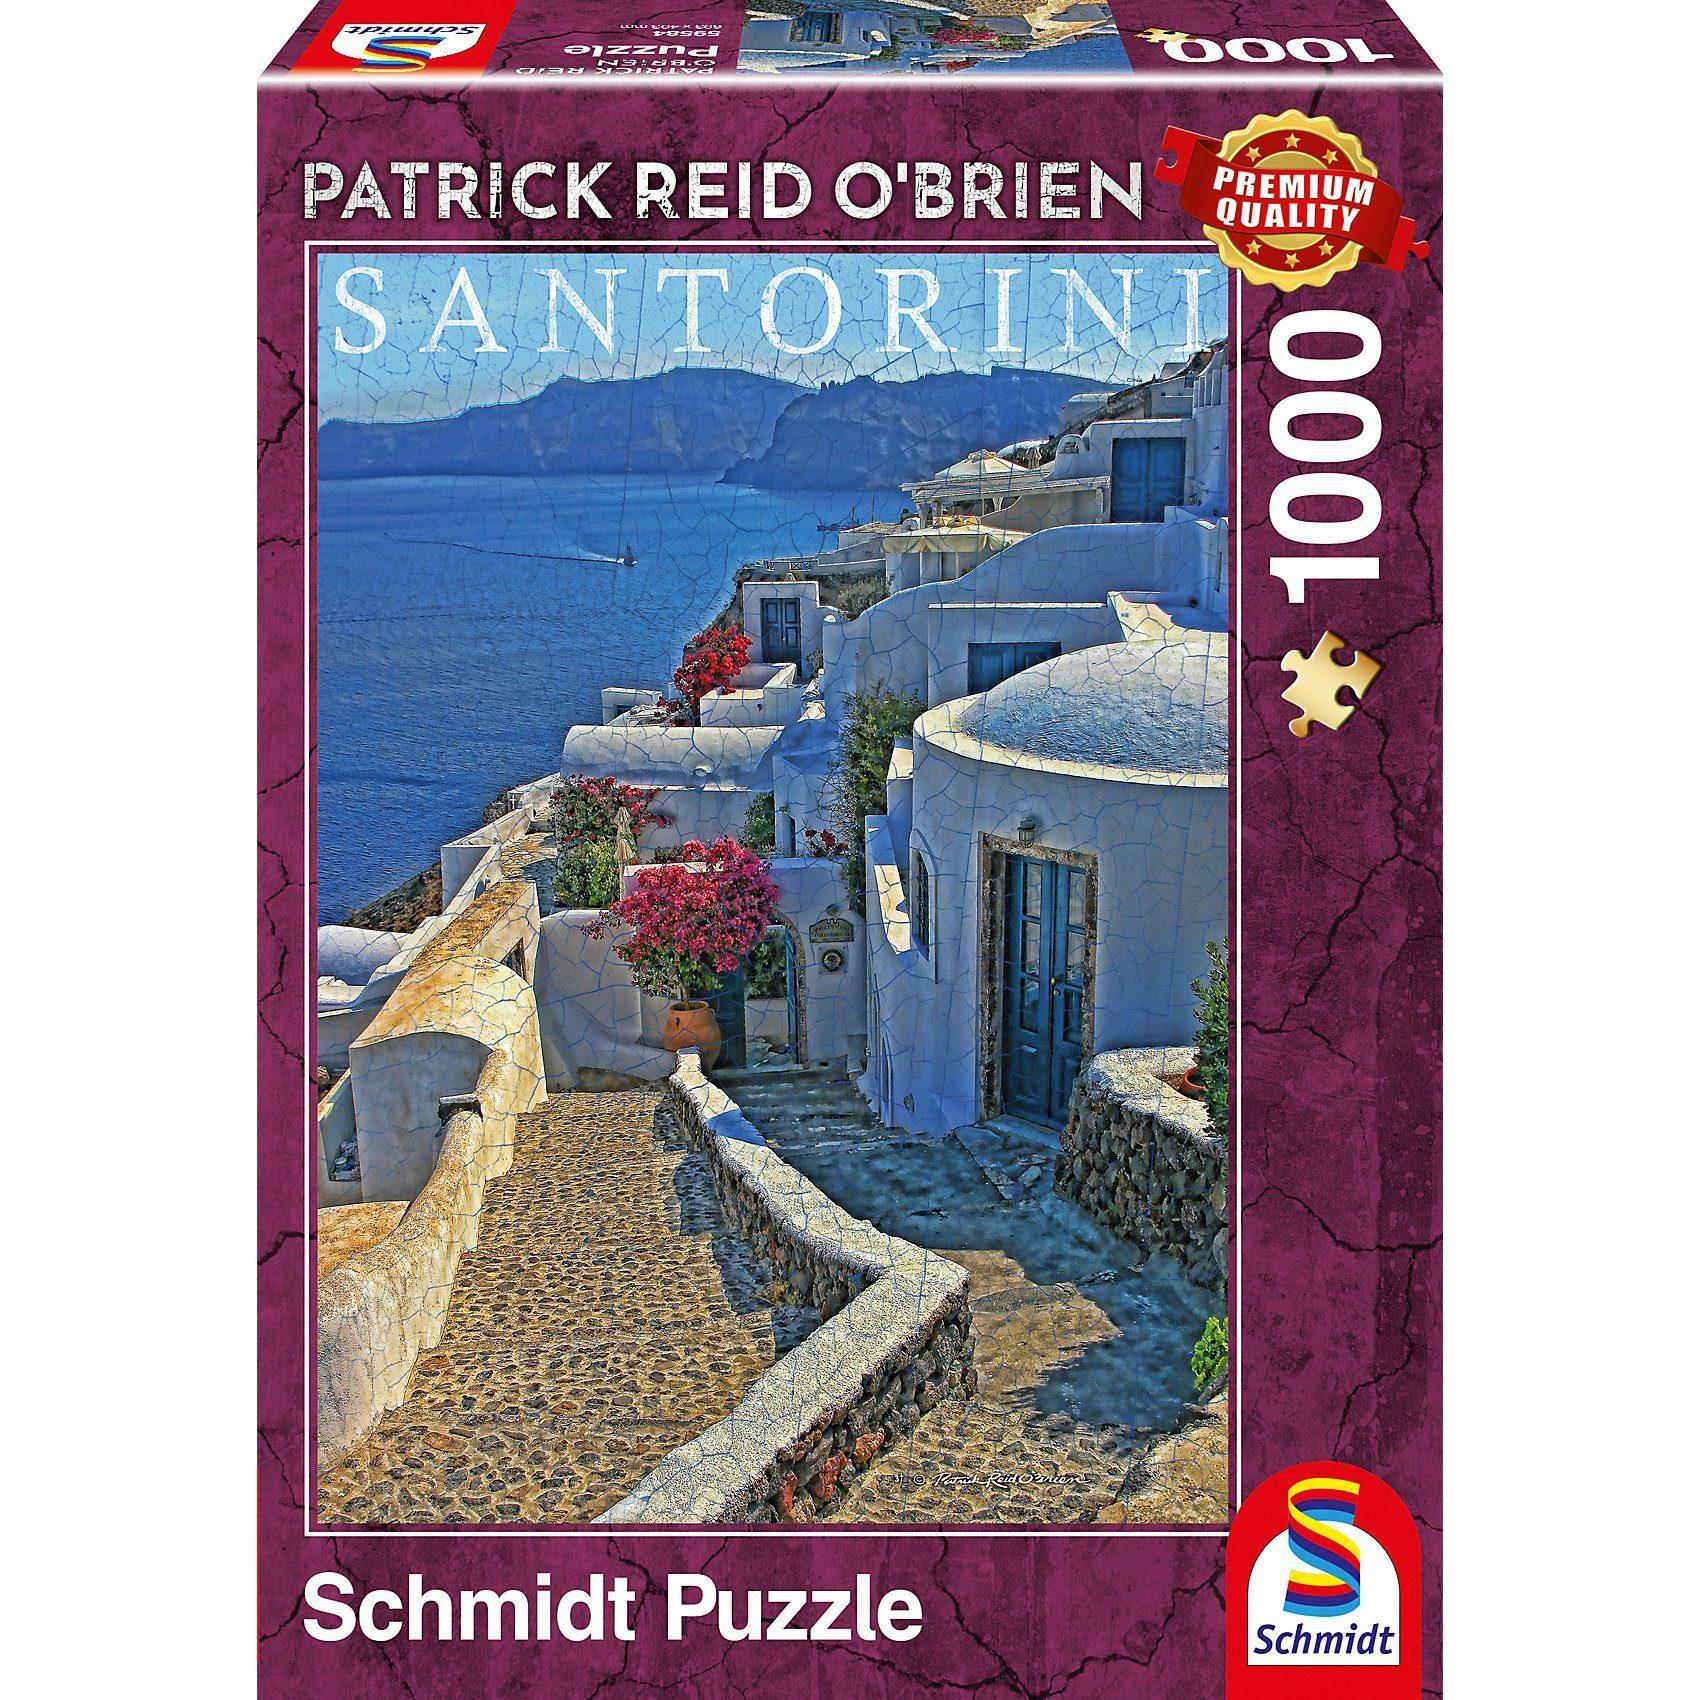 Schmidt Spiele Puzzle 1000 Teile Santorin